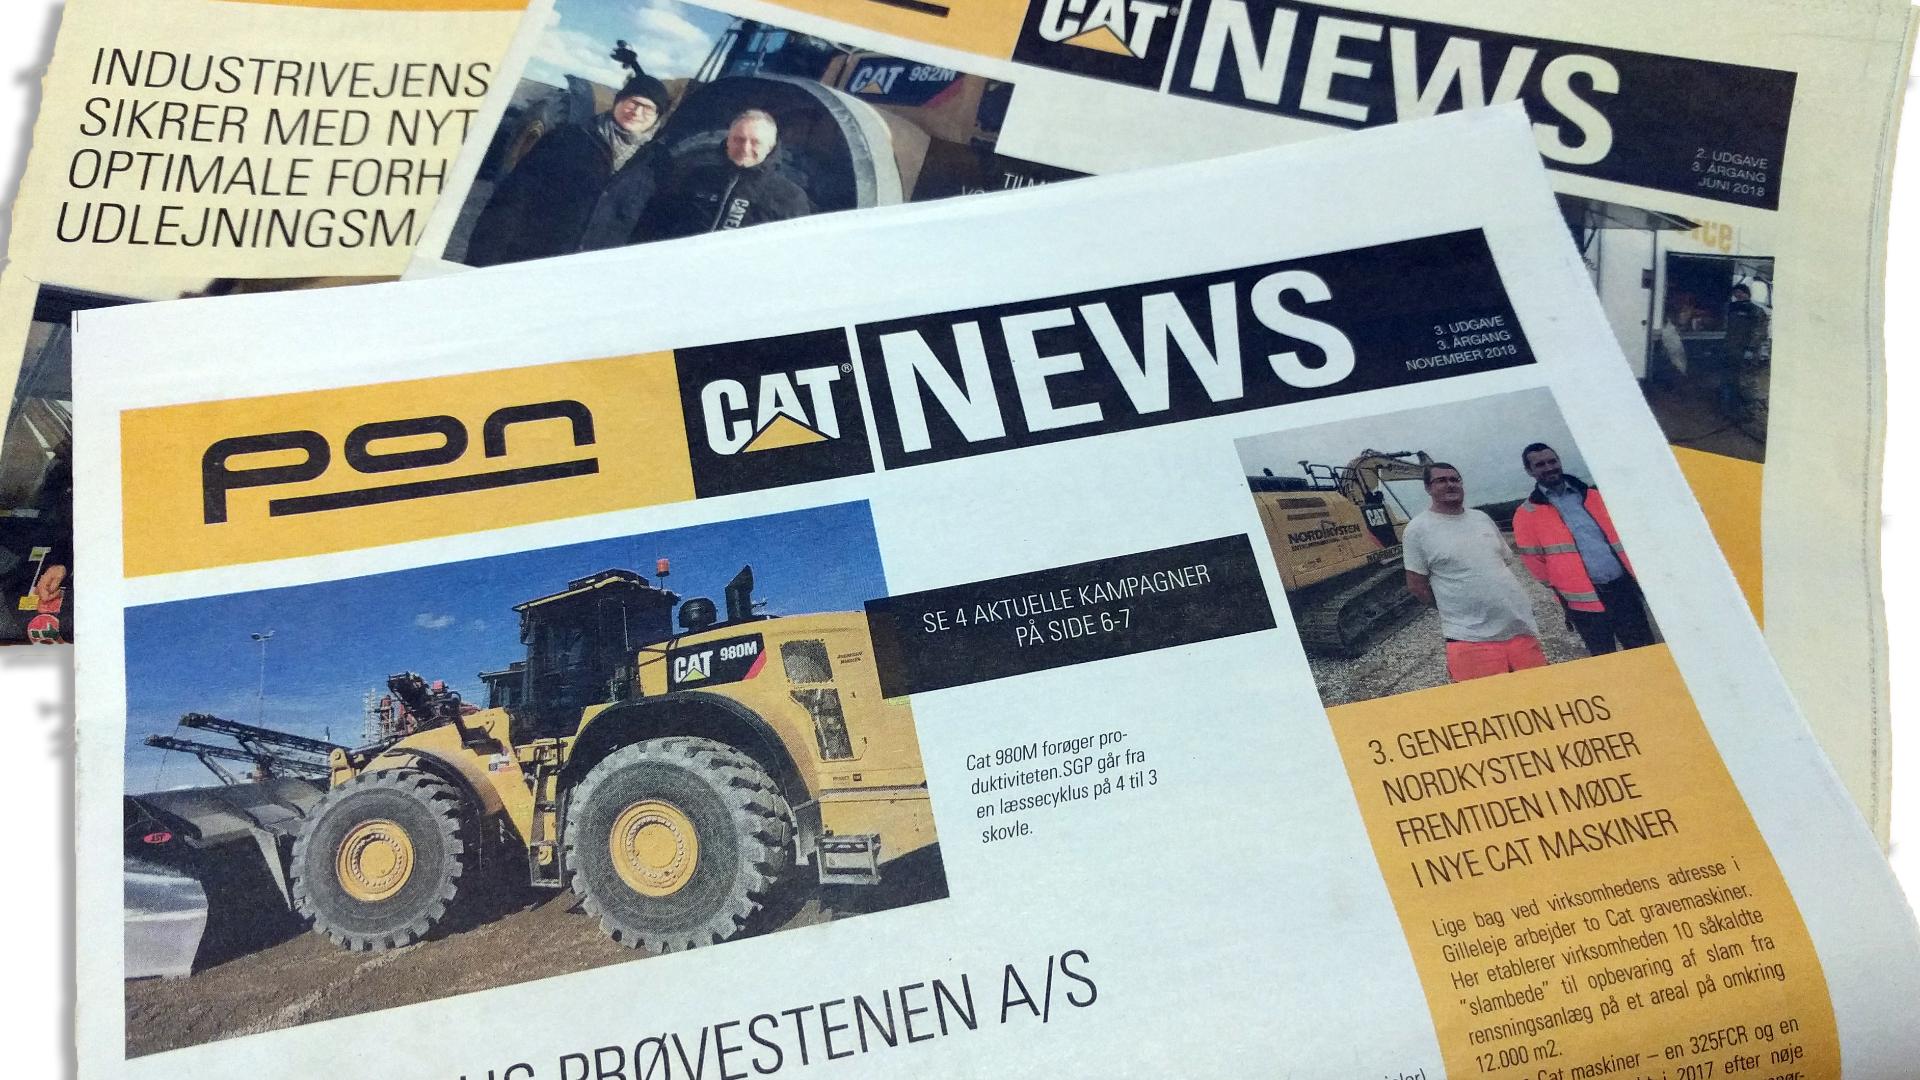 pon-cat news - frontpage web.jpg